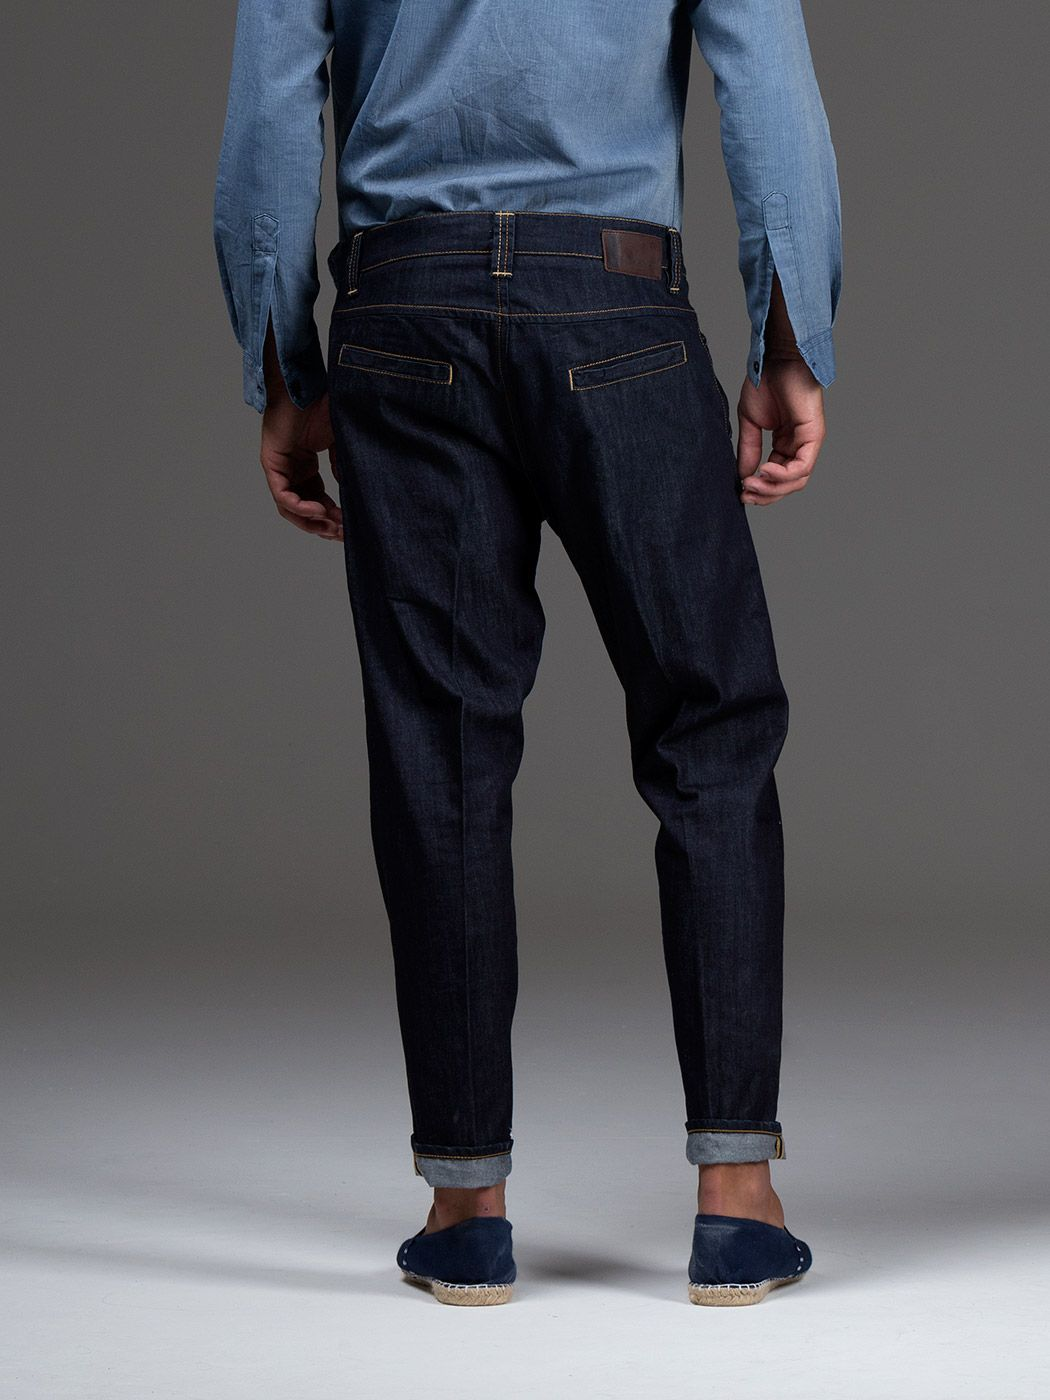 Chino slowcy tasche america, 5∞ taschino con pattina, fondo 16,5 cm, bottoniera. Denim blu fisso 8,75 OZ 100% CO Mama�s wash